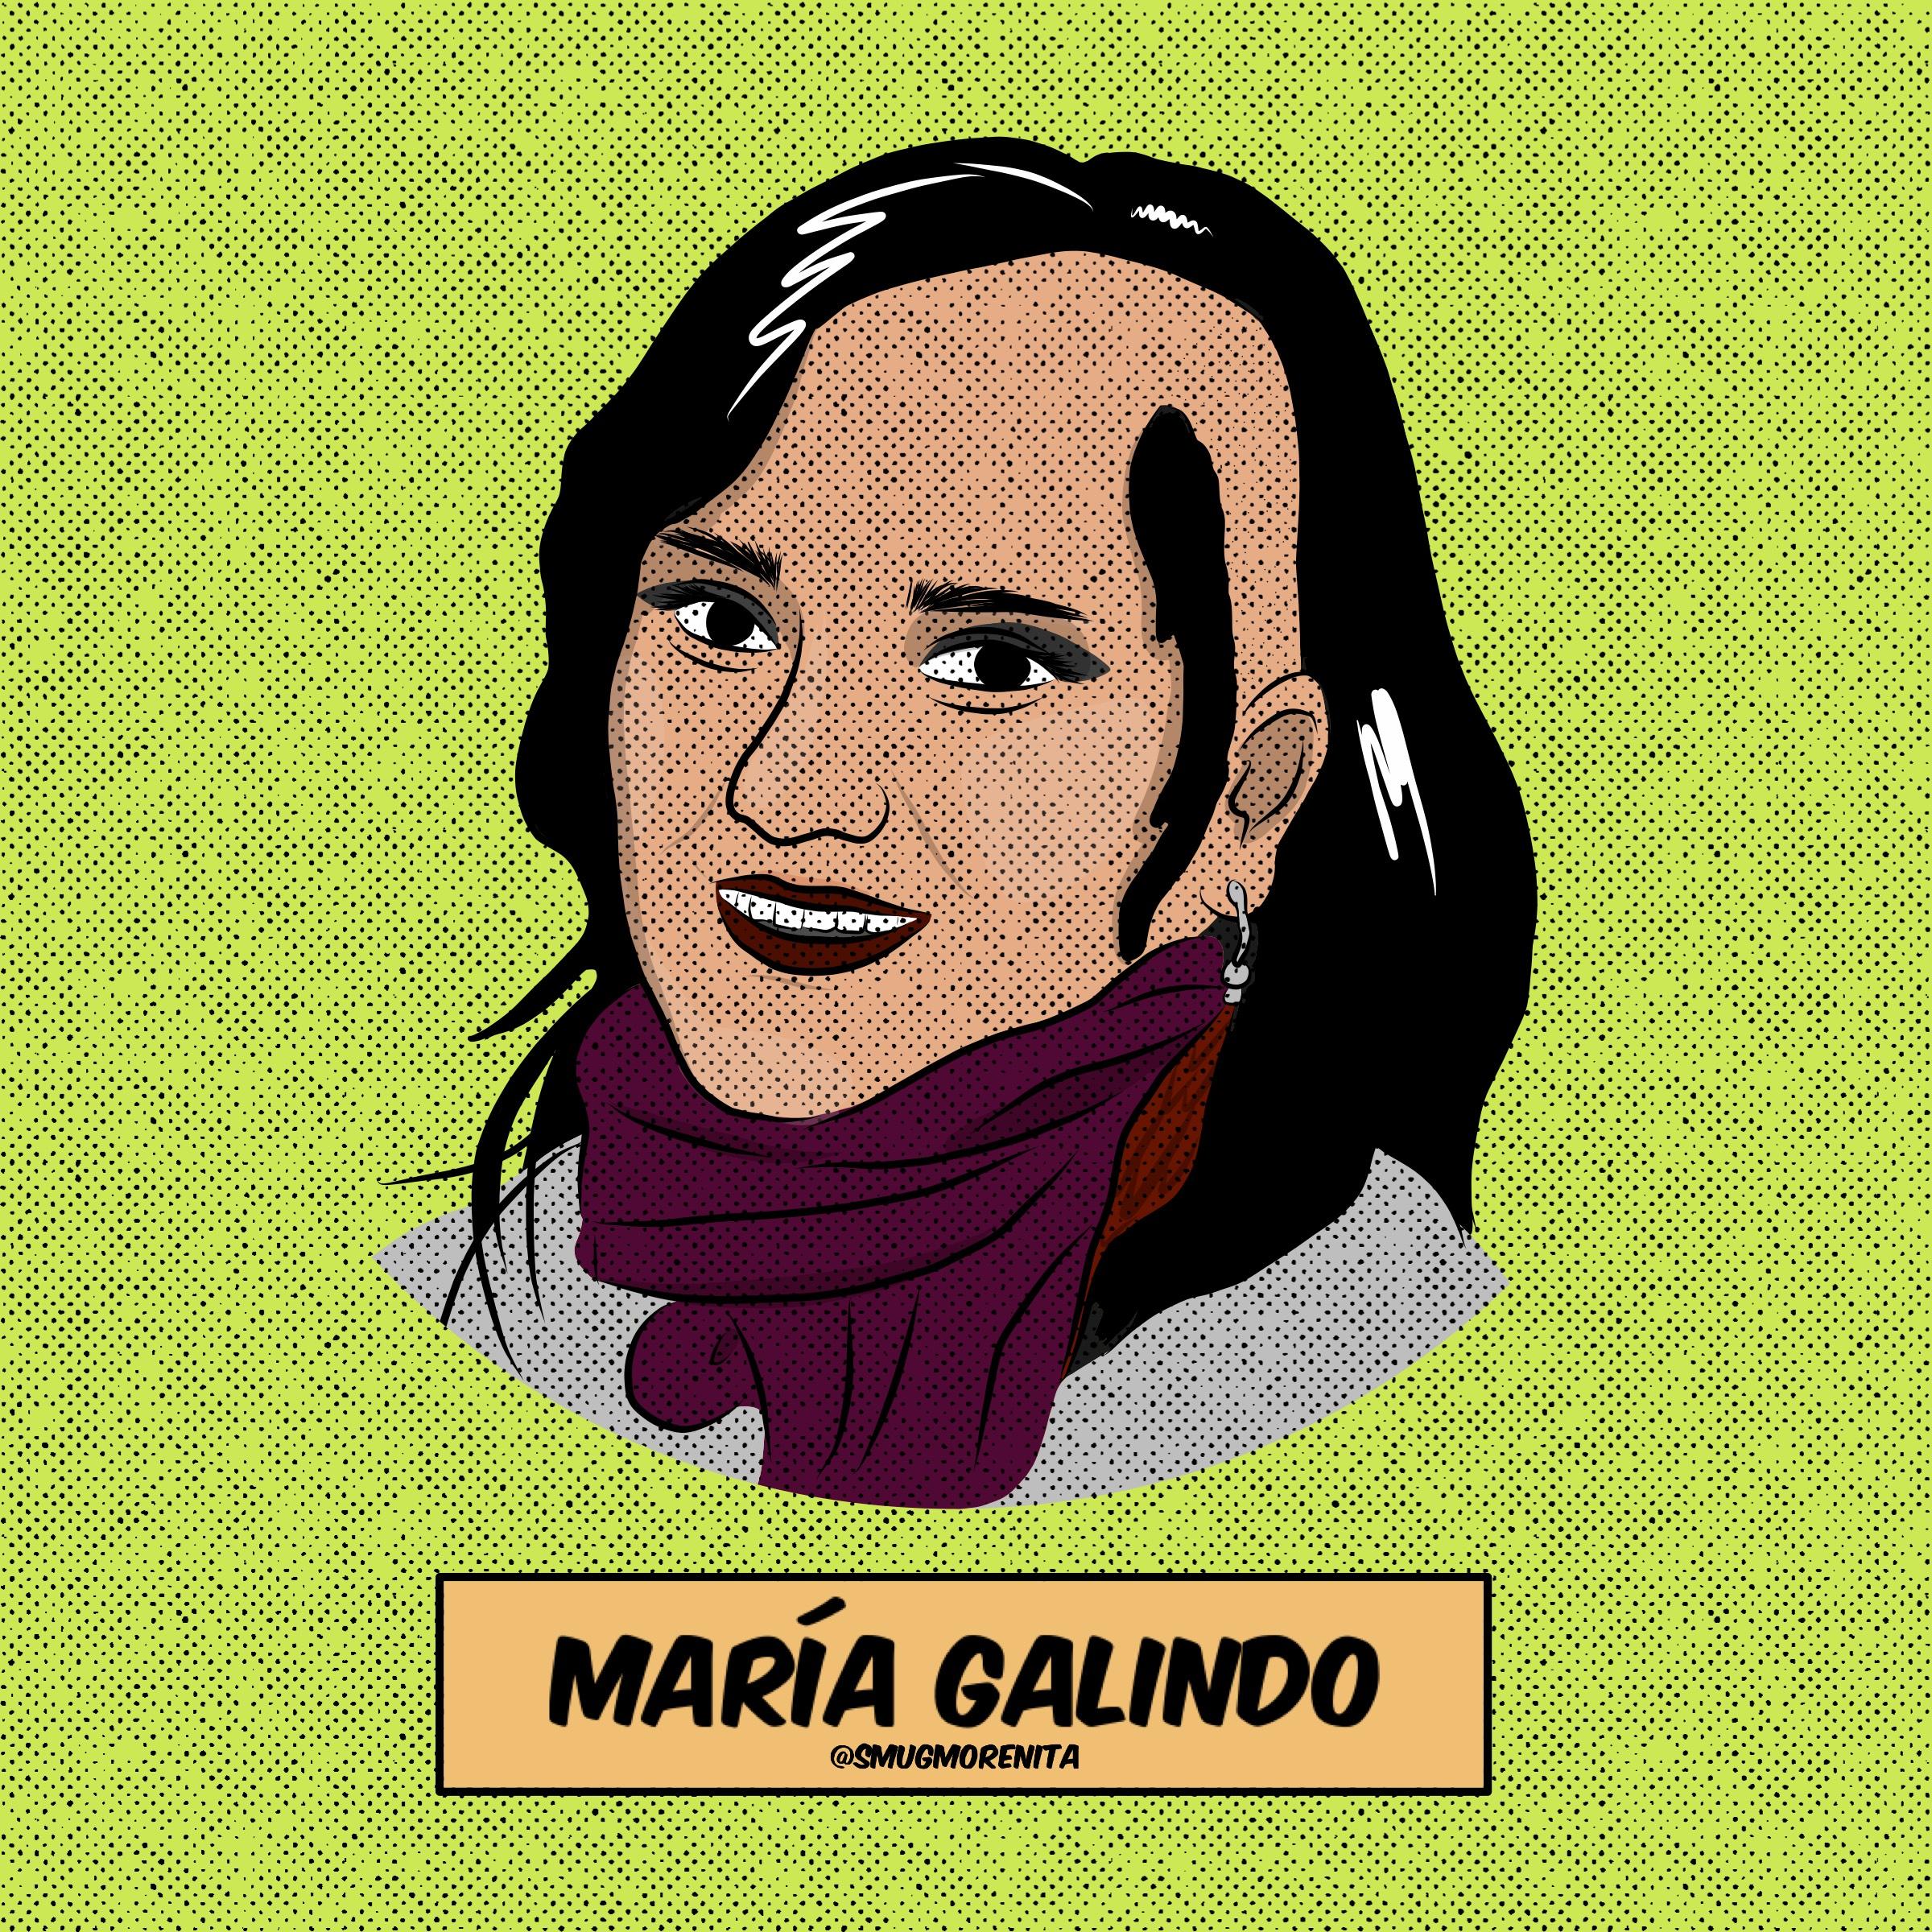 María Galindo - Web Image .jpg